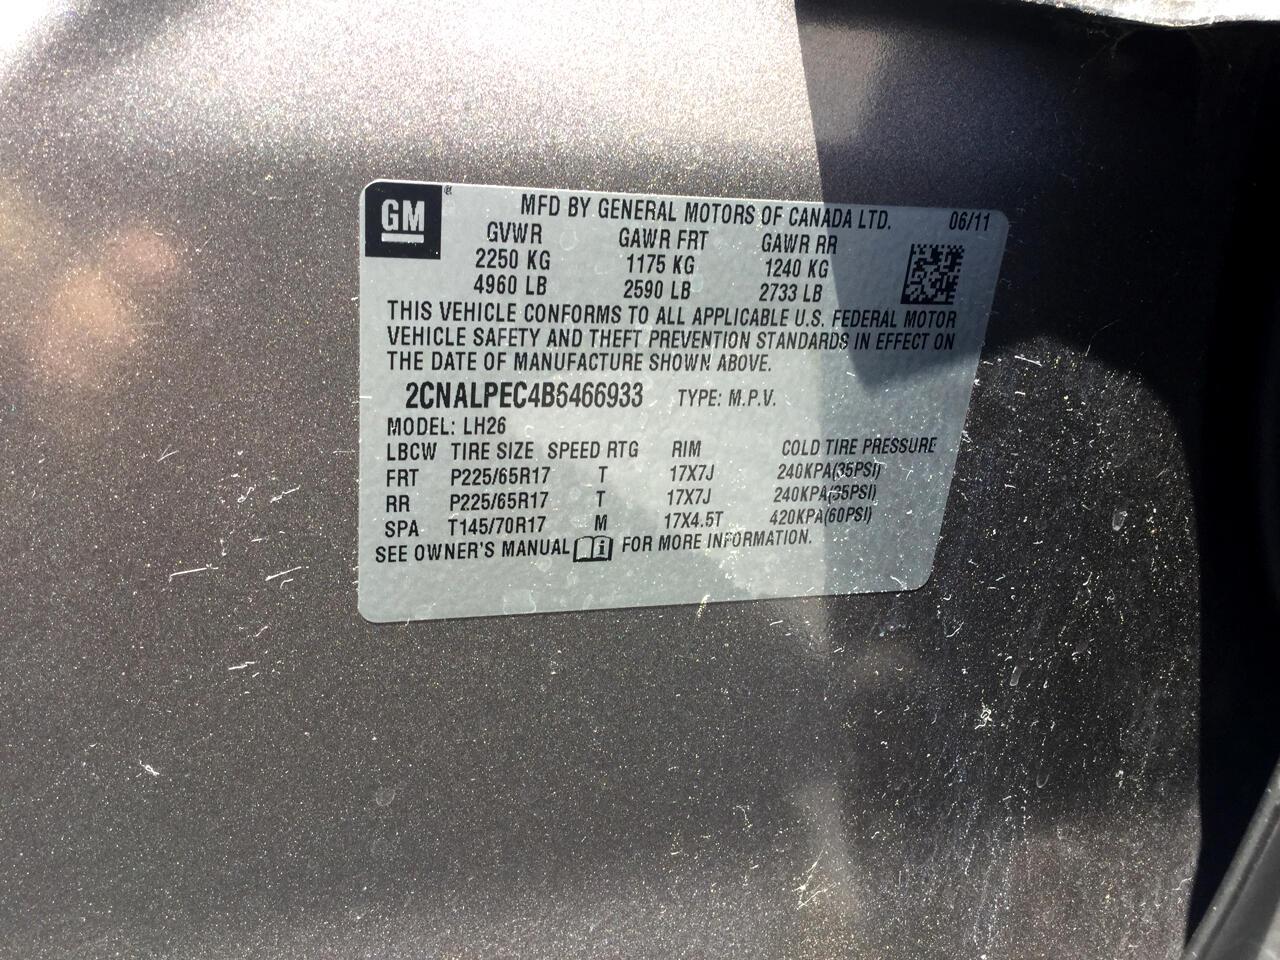 2011 Chevrolet Equinox FWD 4dr LT w/2LT